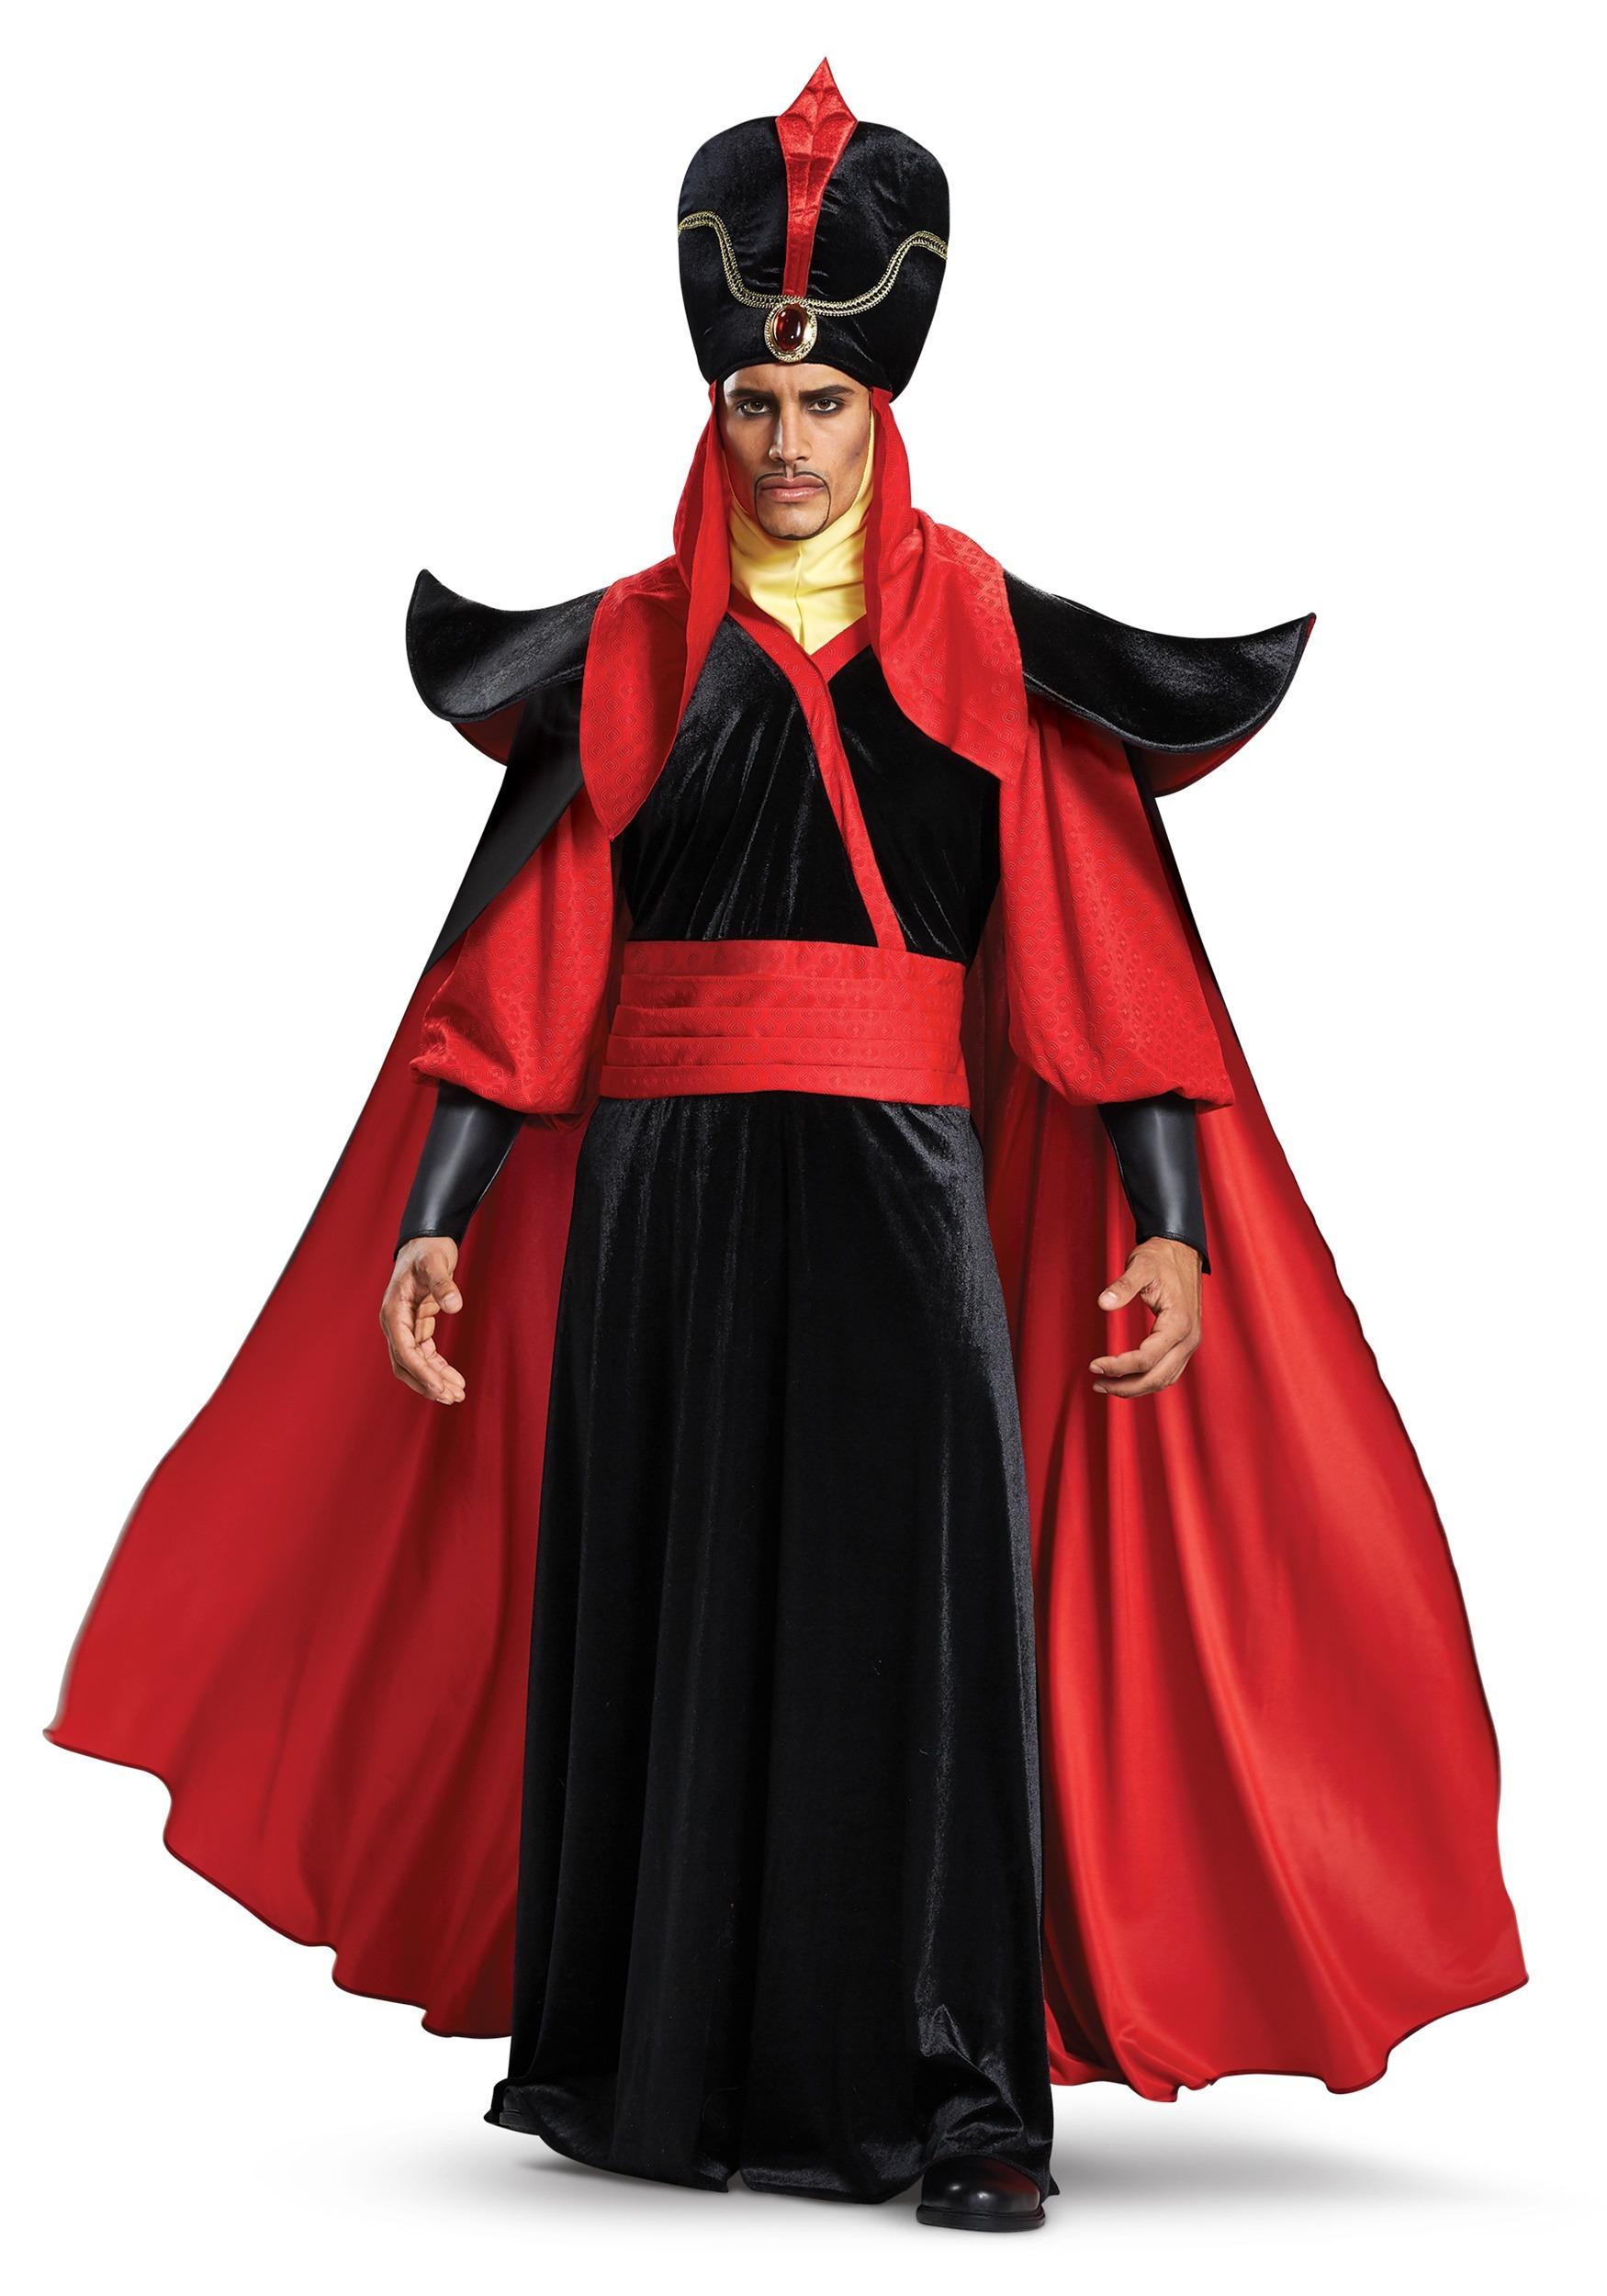 Disney Aladdin Jafar Costume For Men